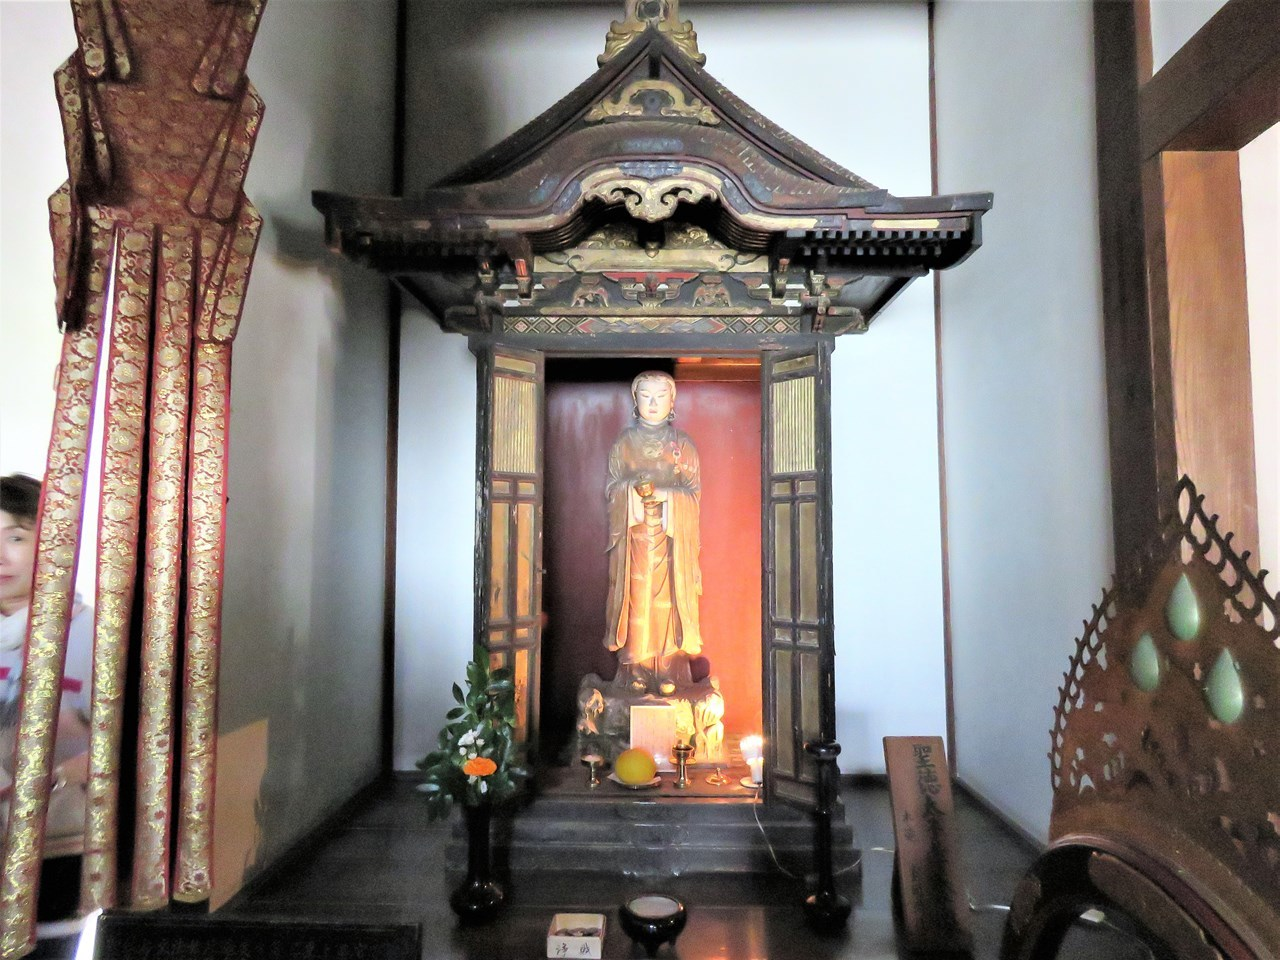 s-聖徳太子孝養像